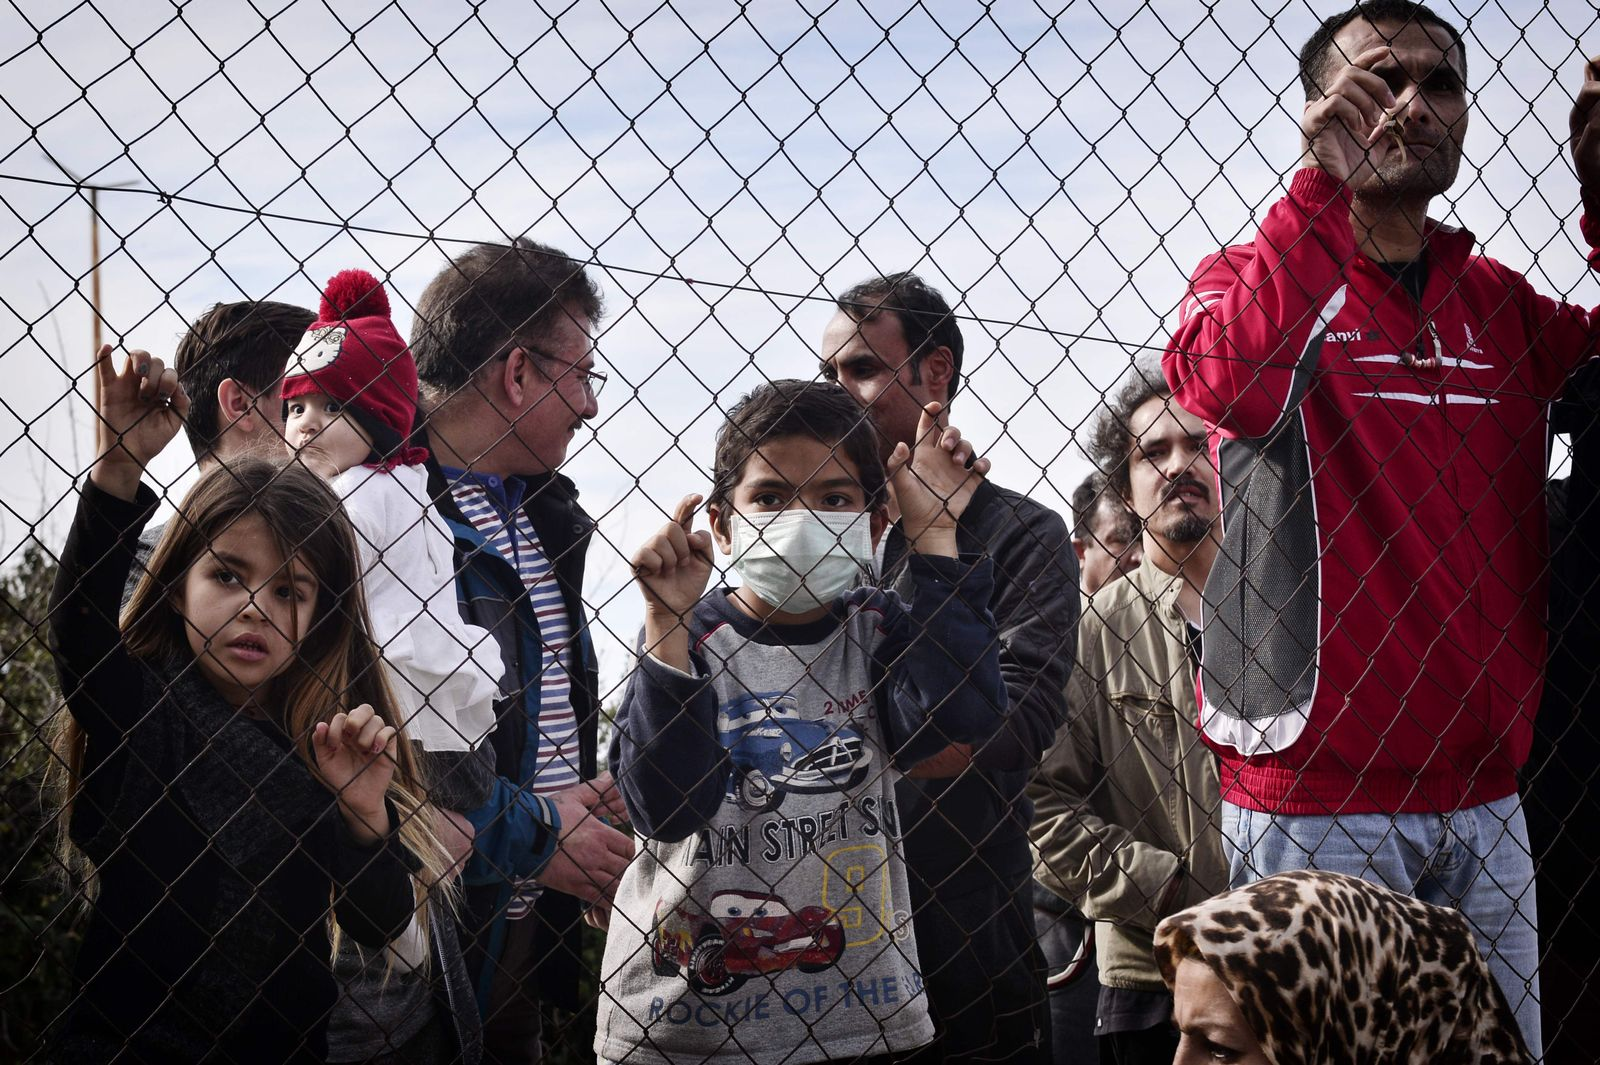 TOPSHOT-GREECE-EU-MIGRANT-AFGHANISTAN-PROTEST